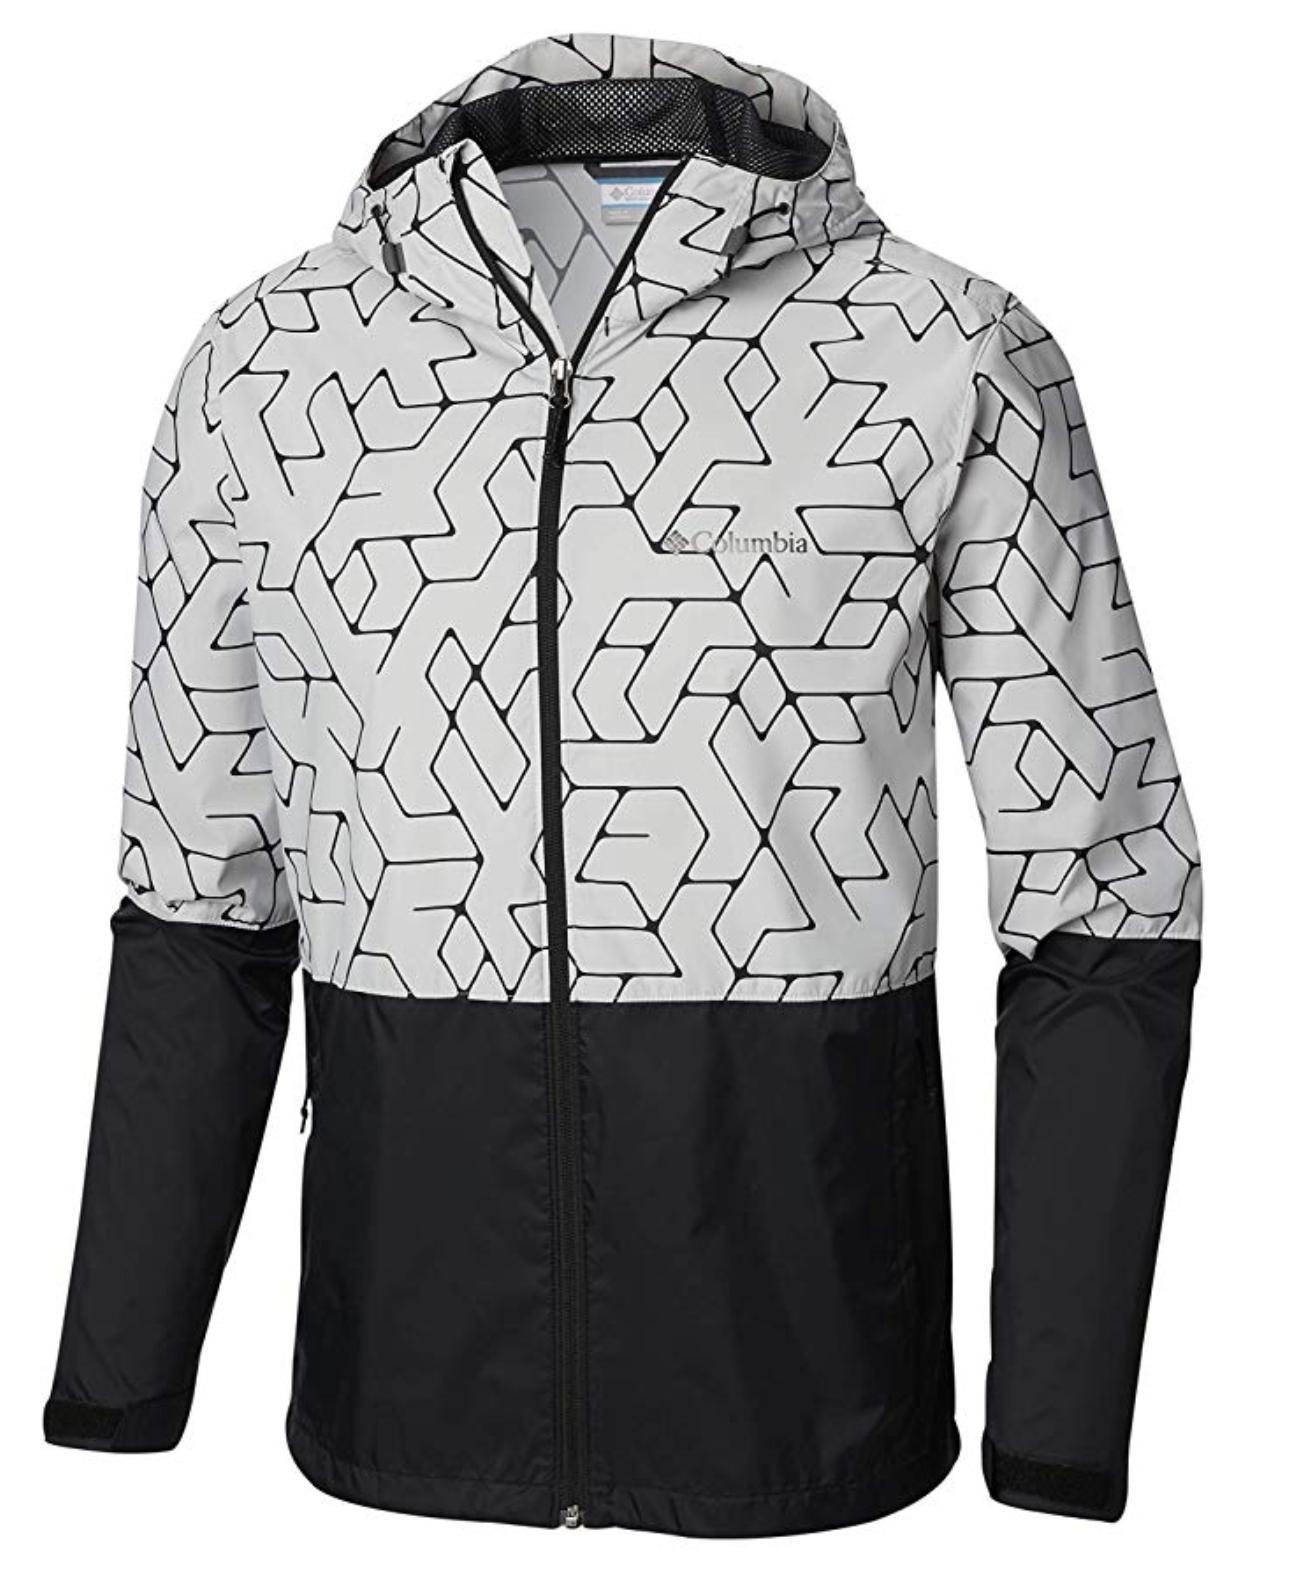 Columbia Men's Rain Jacket